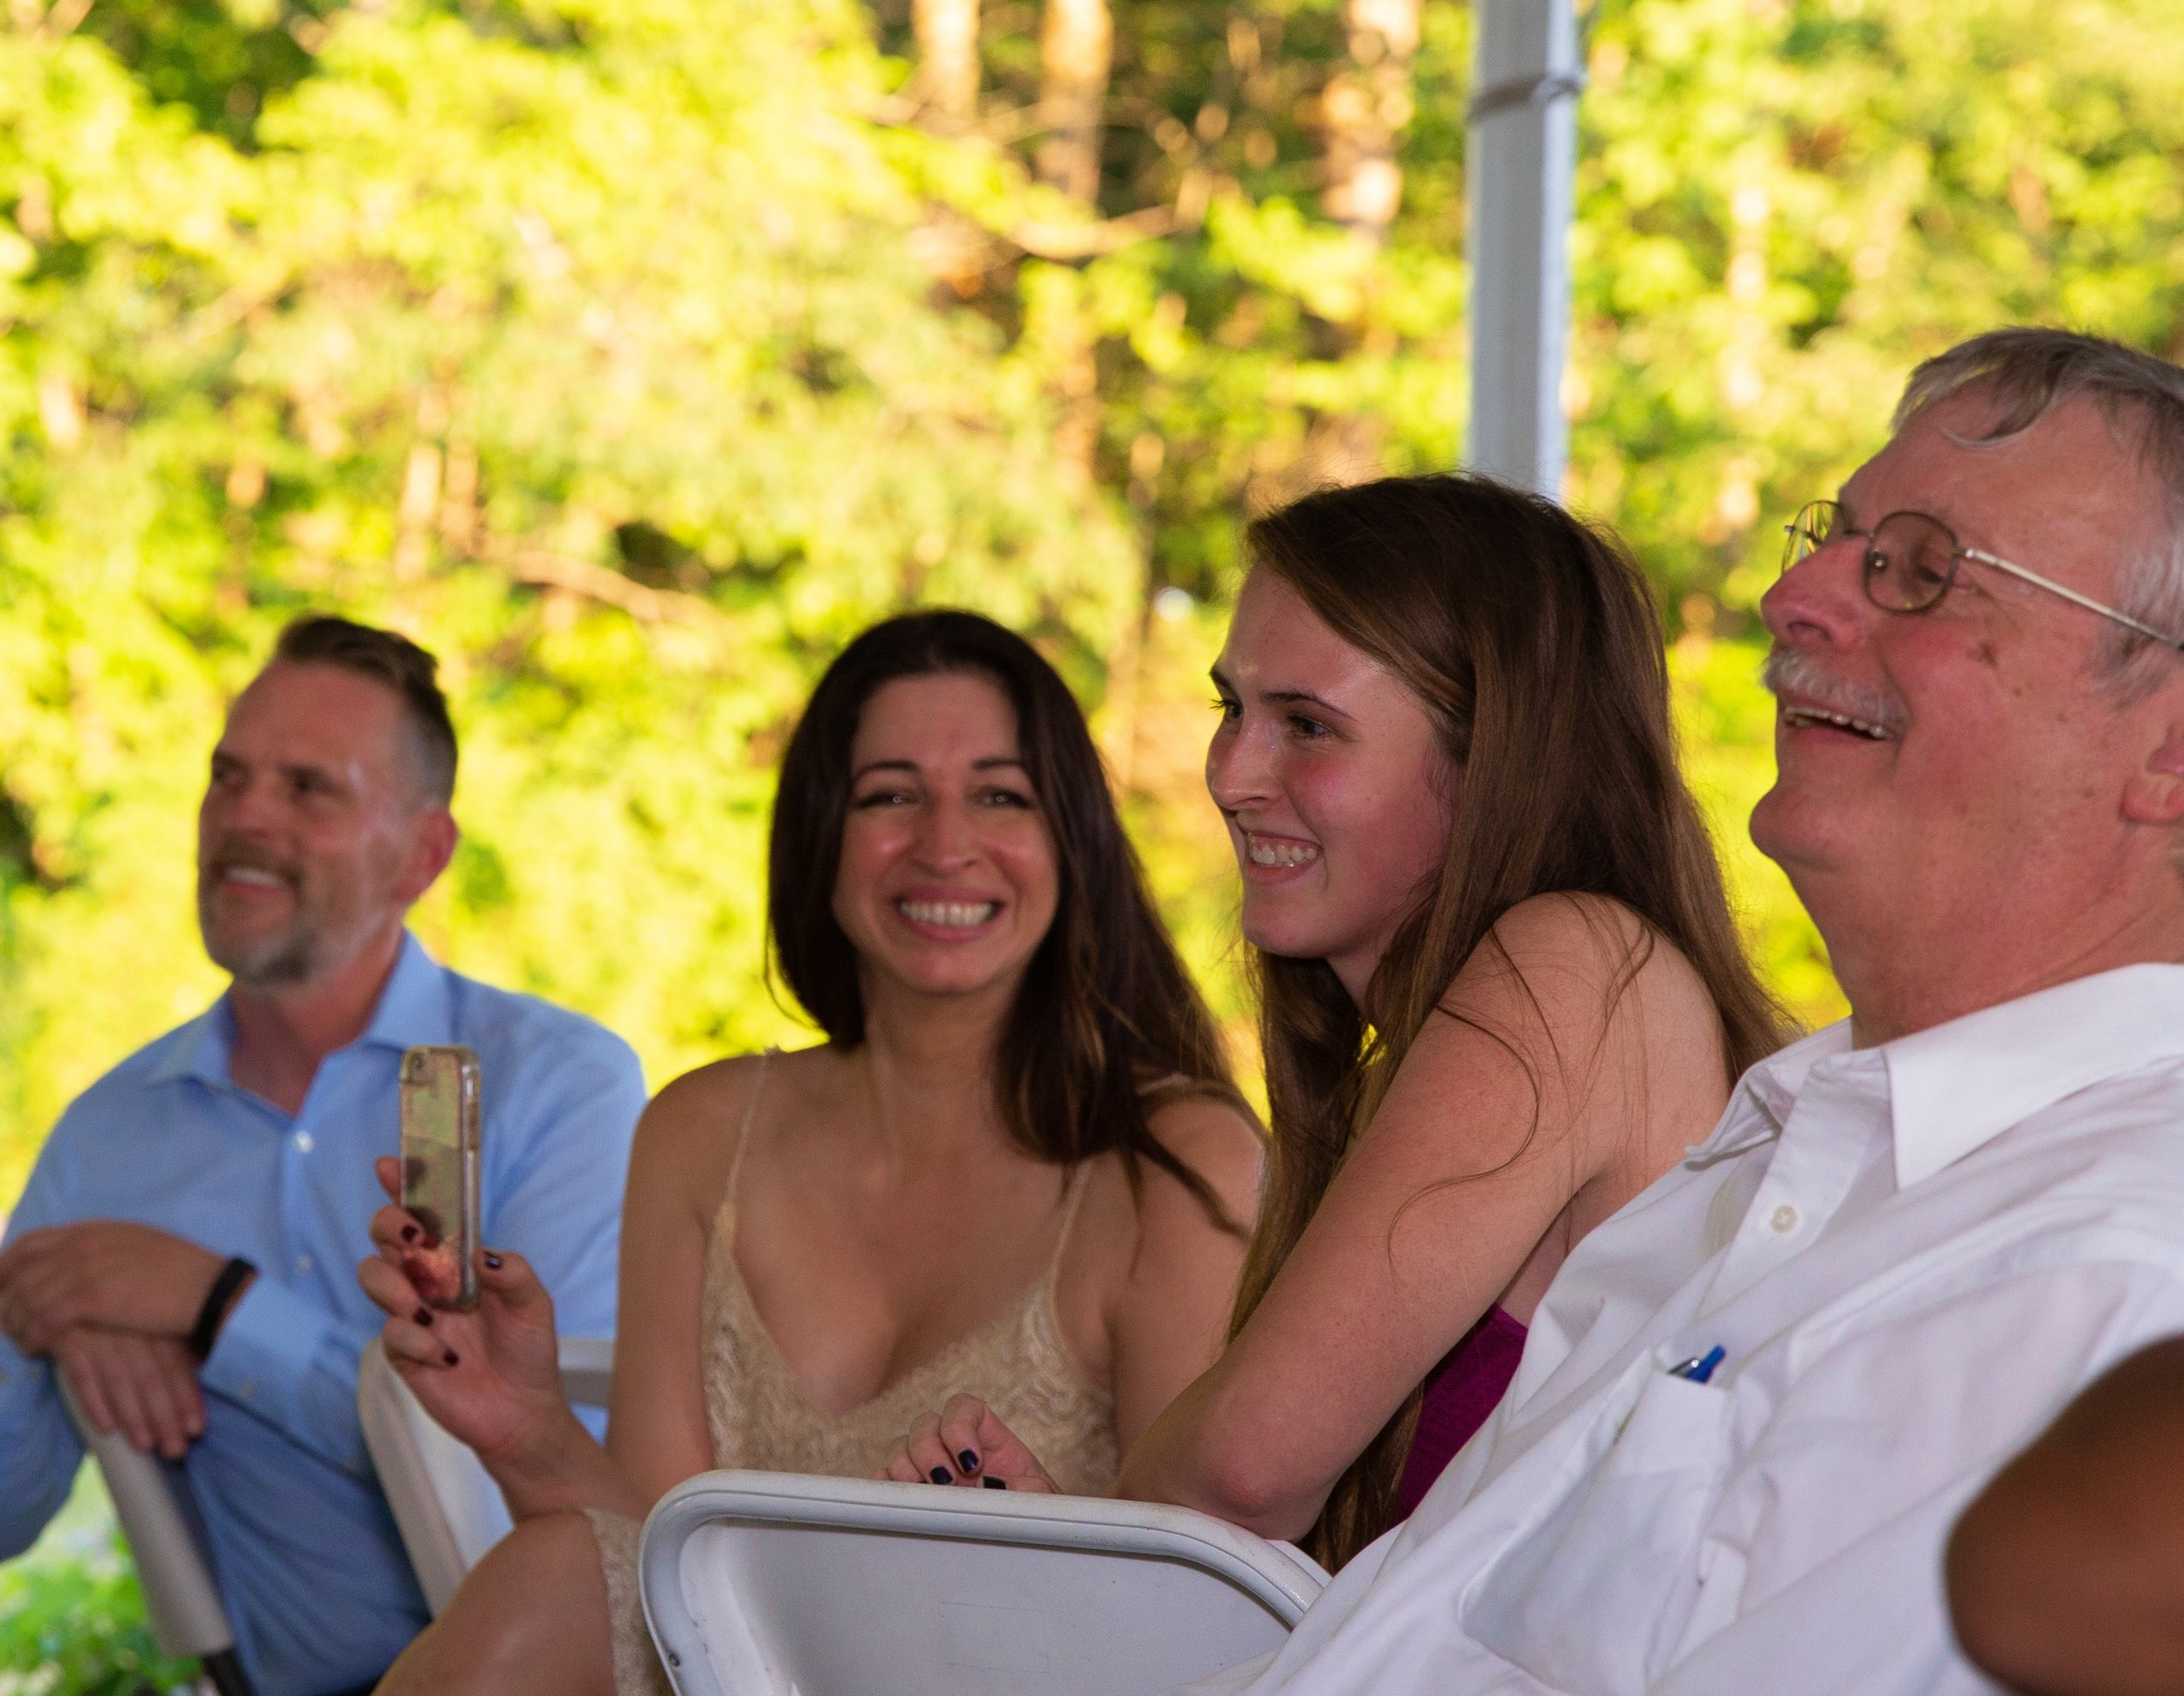 annabel smile table 2.jpg